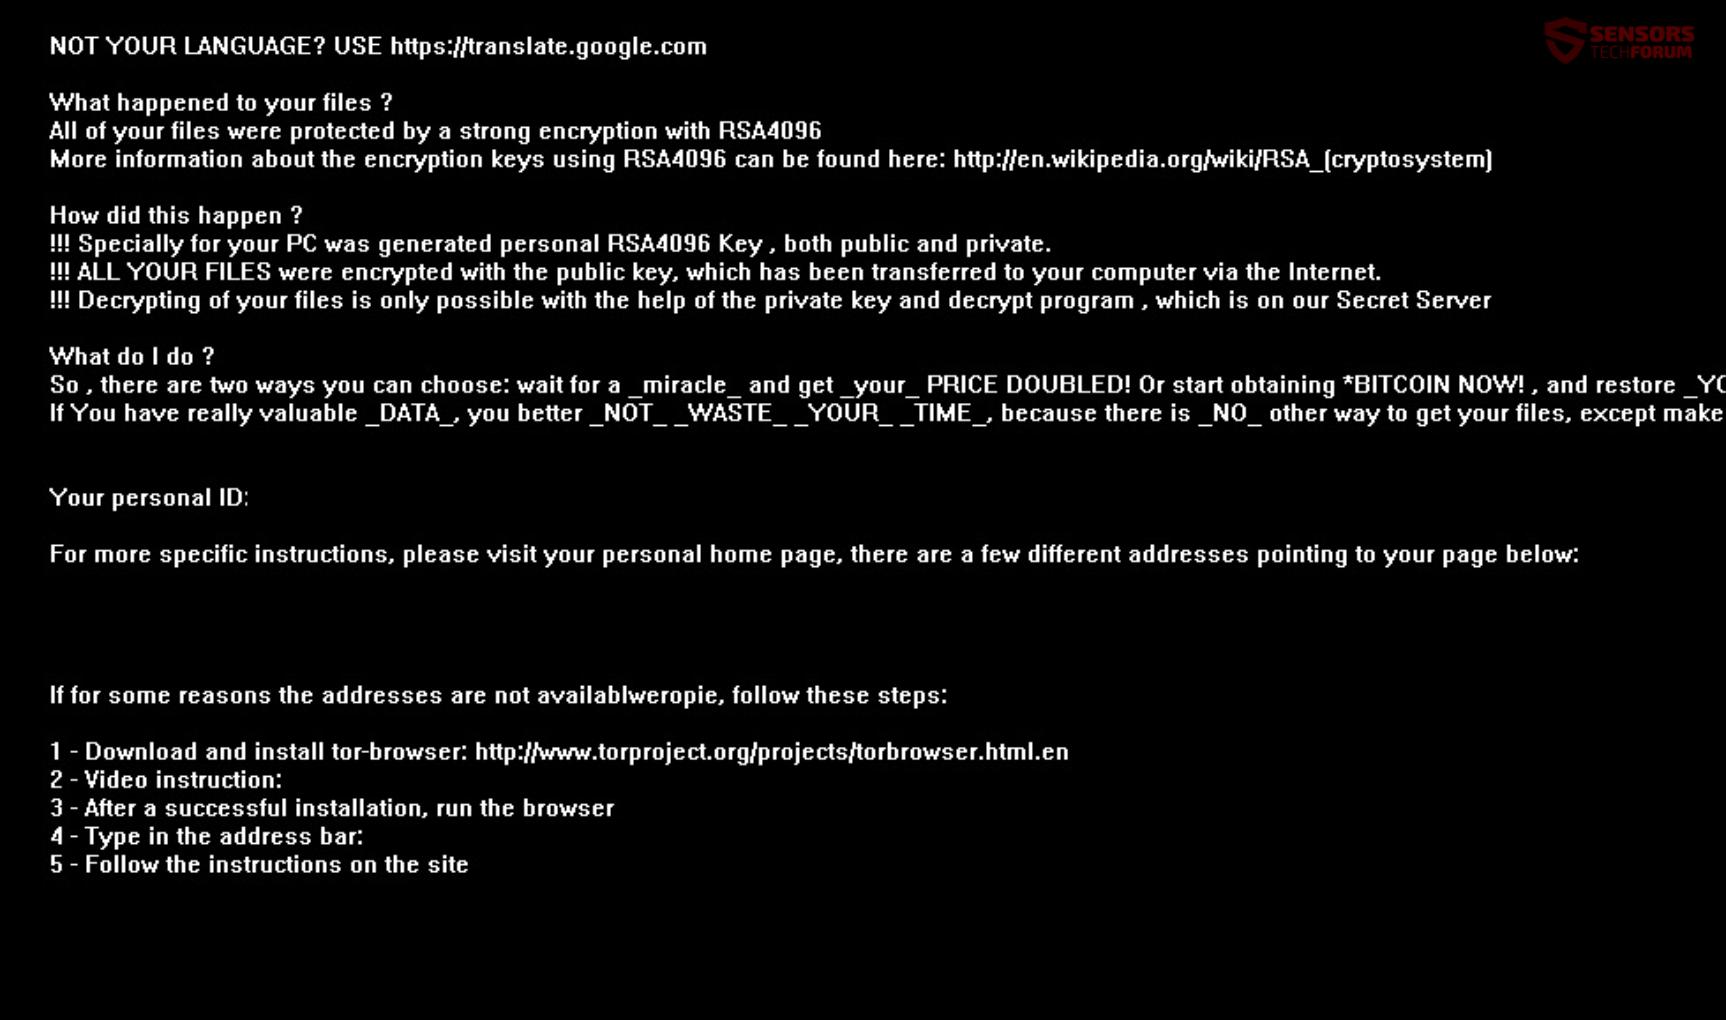 STF-crypmic-cryptxxx-ransomware-copycat-ransom-note